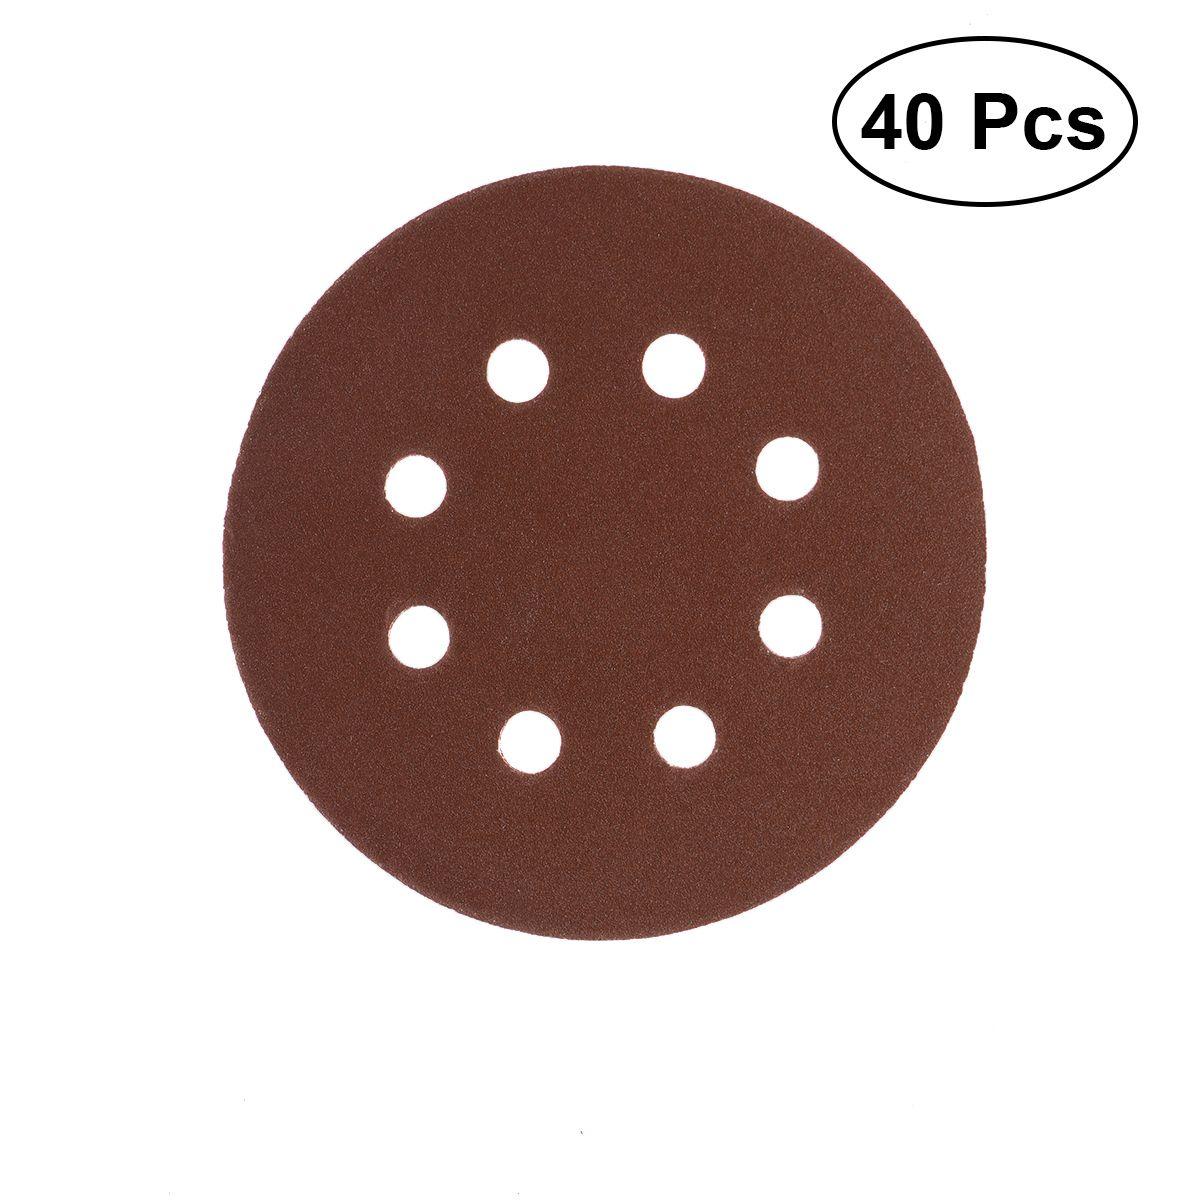 40pcs 8 Hole Abrasive Sandpaper 5 Inch Sanding Discs 60 80 120 210 Grit For Bosch Pex 220 300 Random Orbital Sander 125mm S Izobrazheniyami